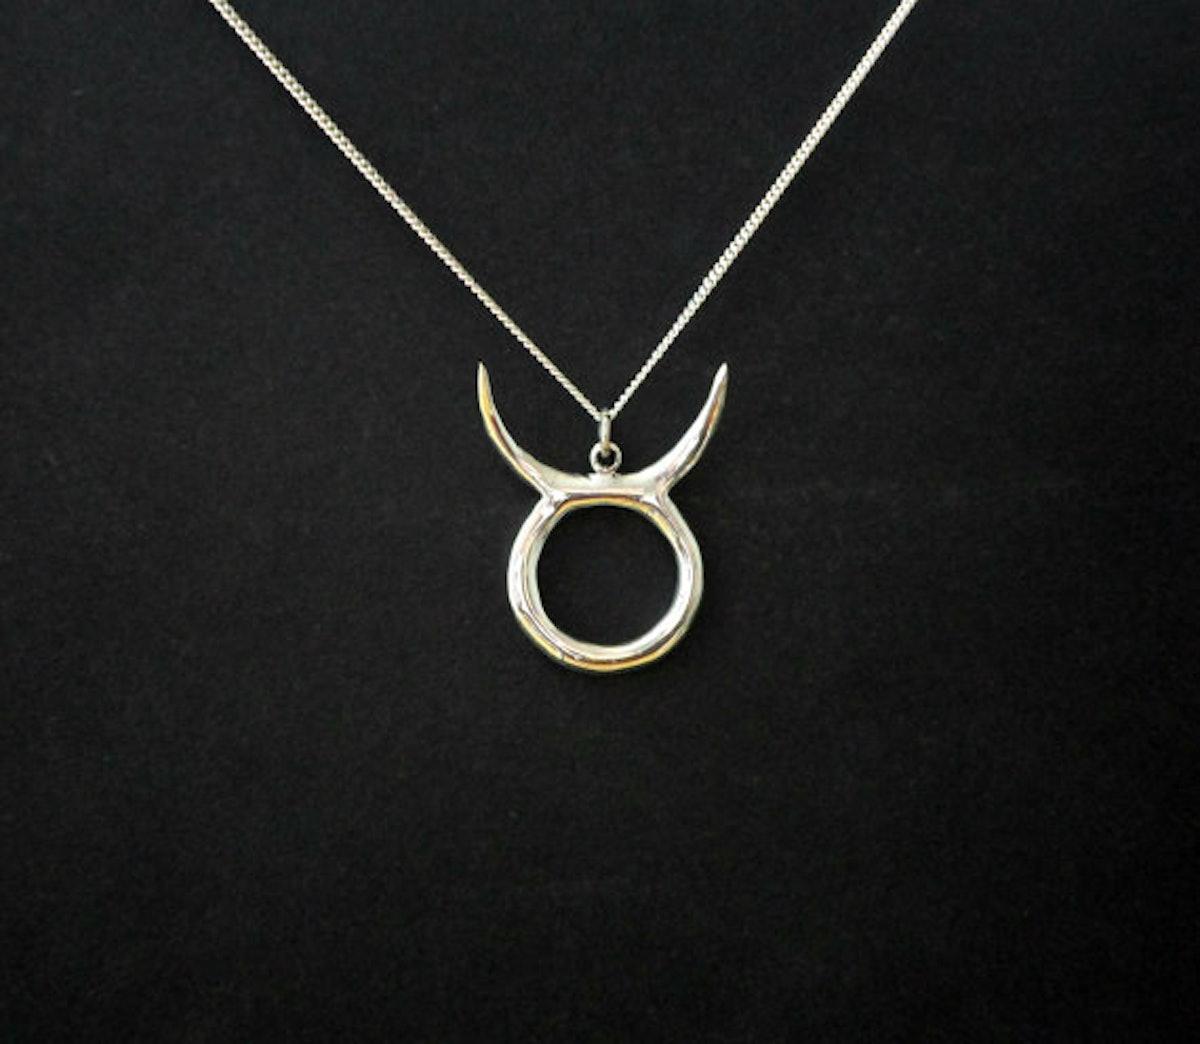 jewelsculpts zodiac necklace